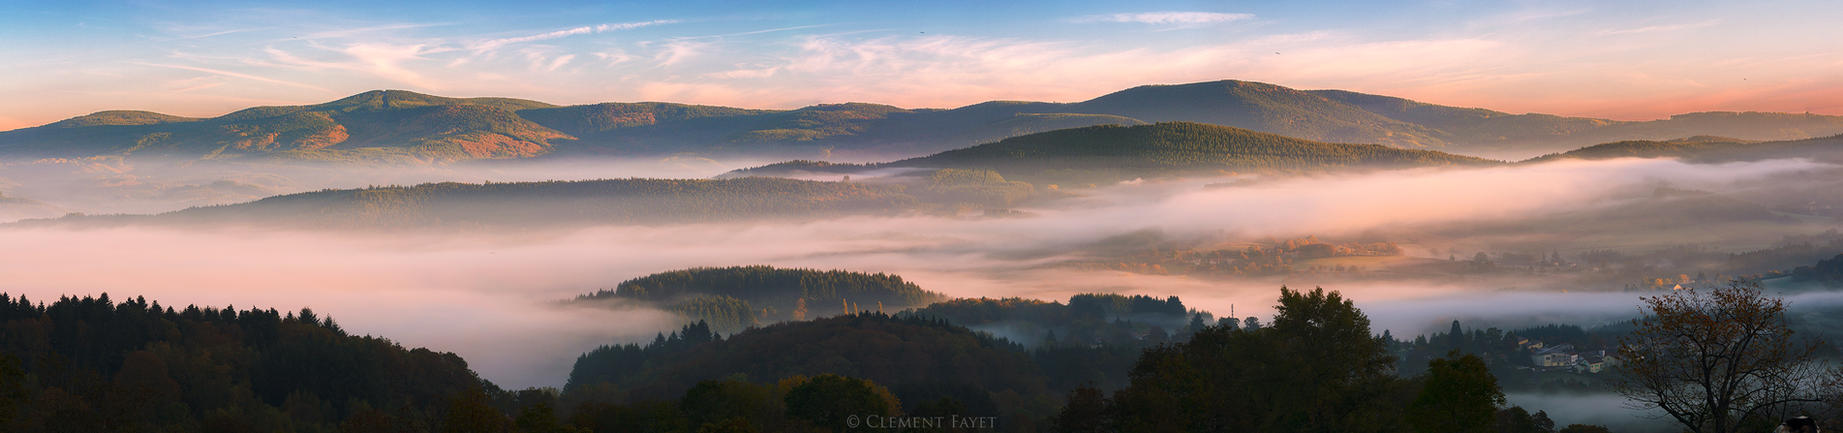 Autumnal Haze by LG77